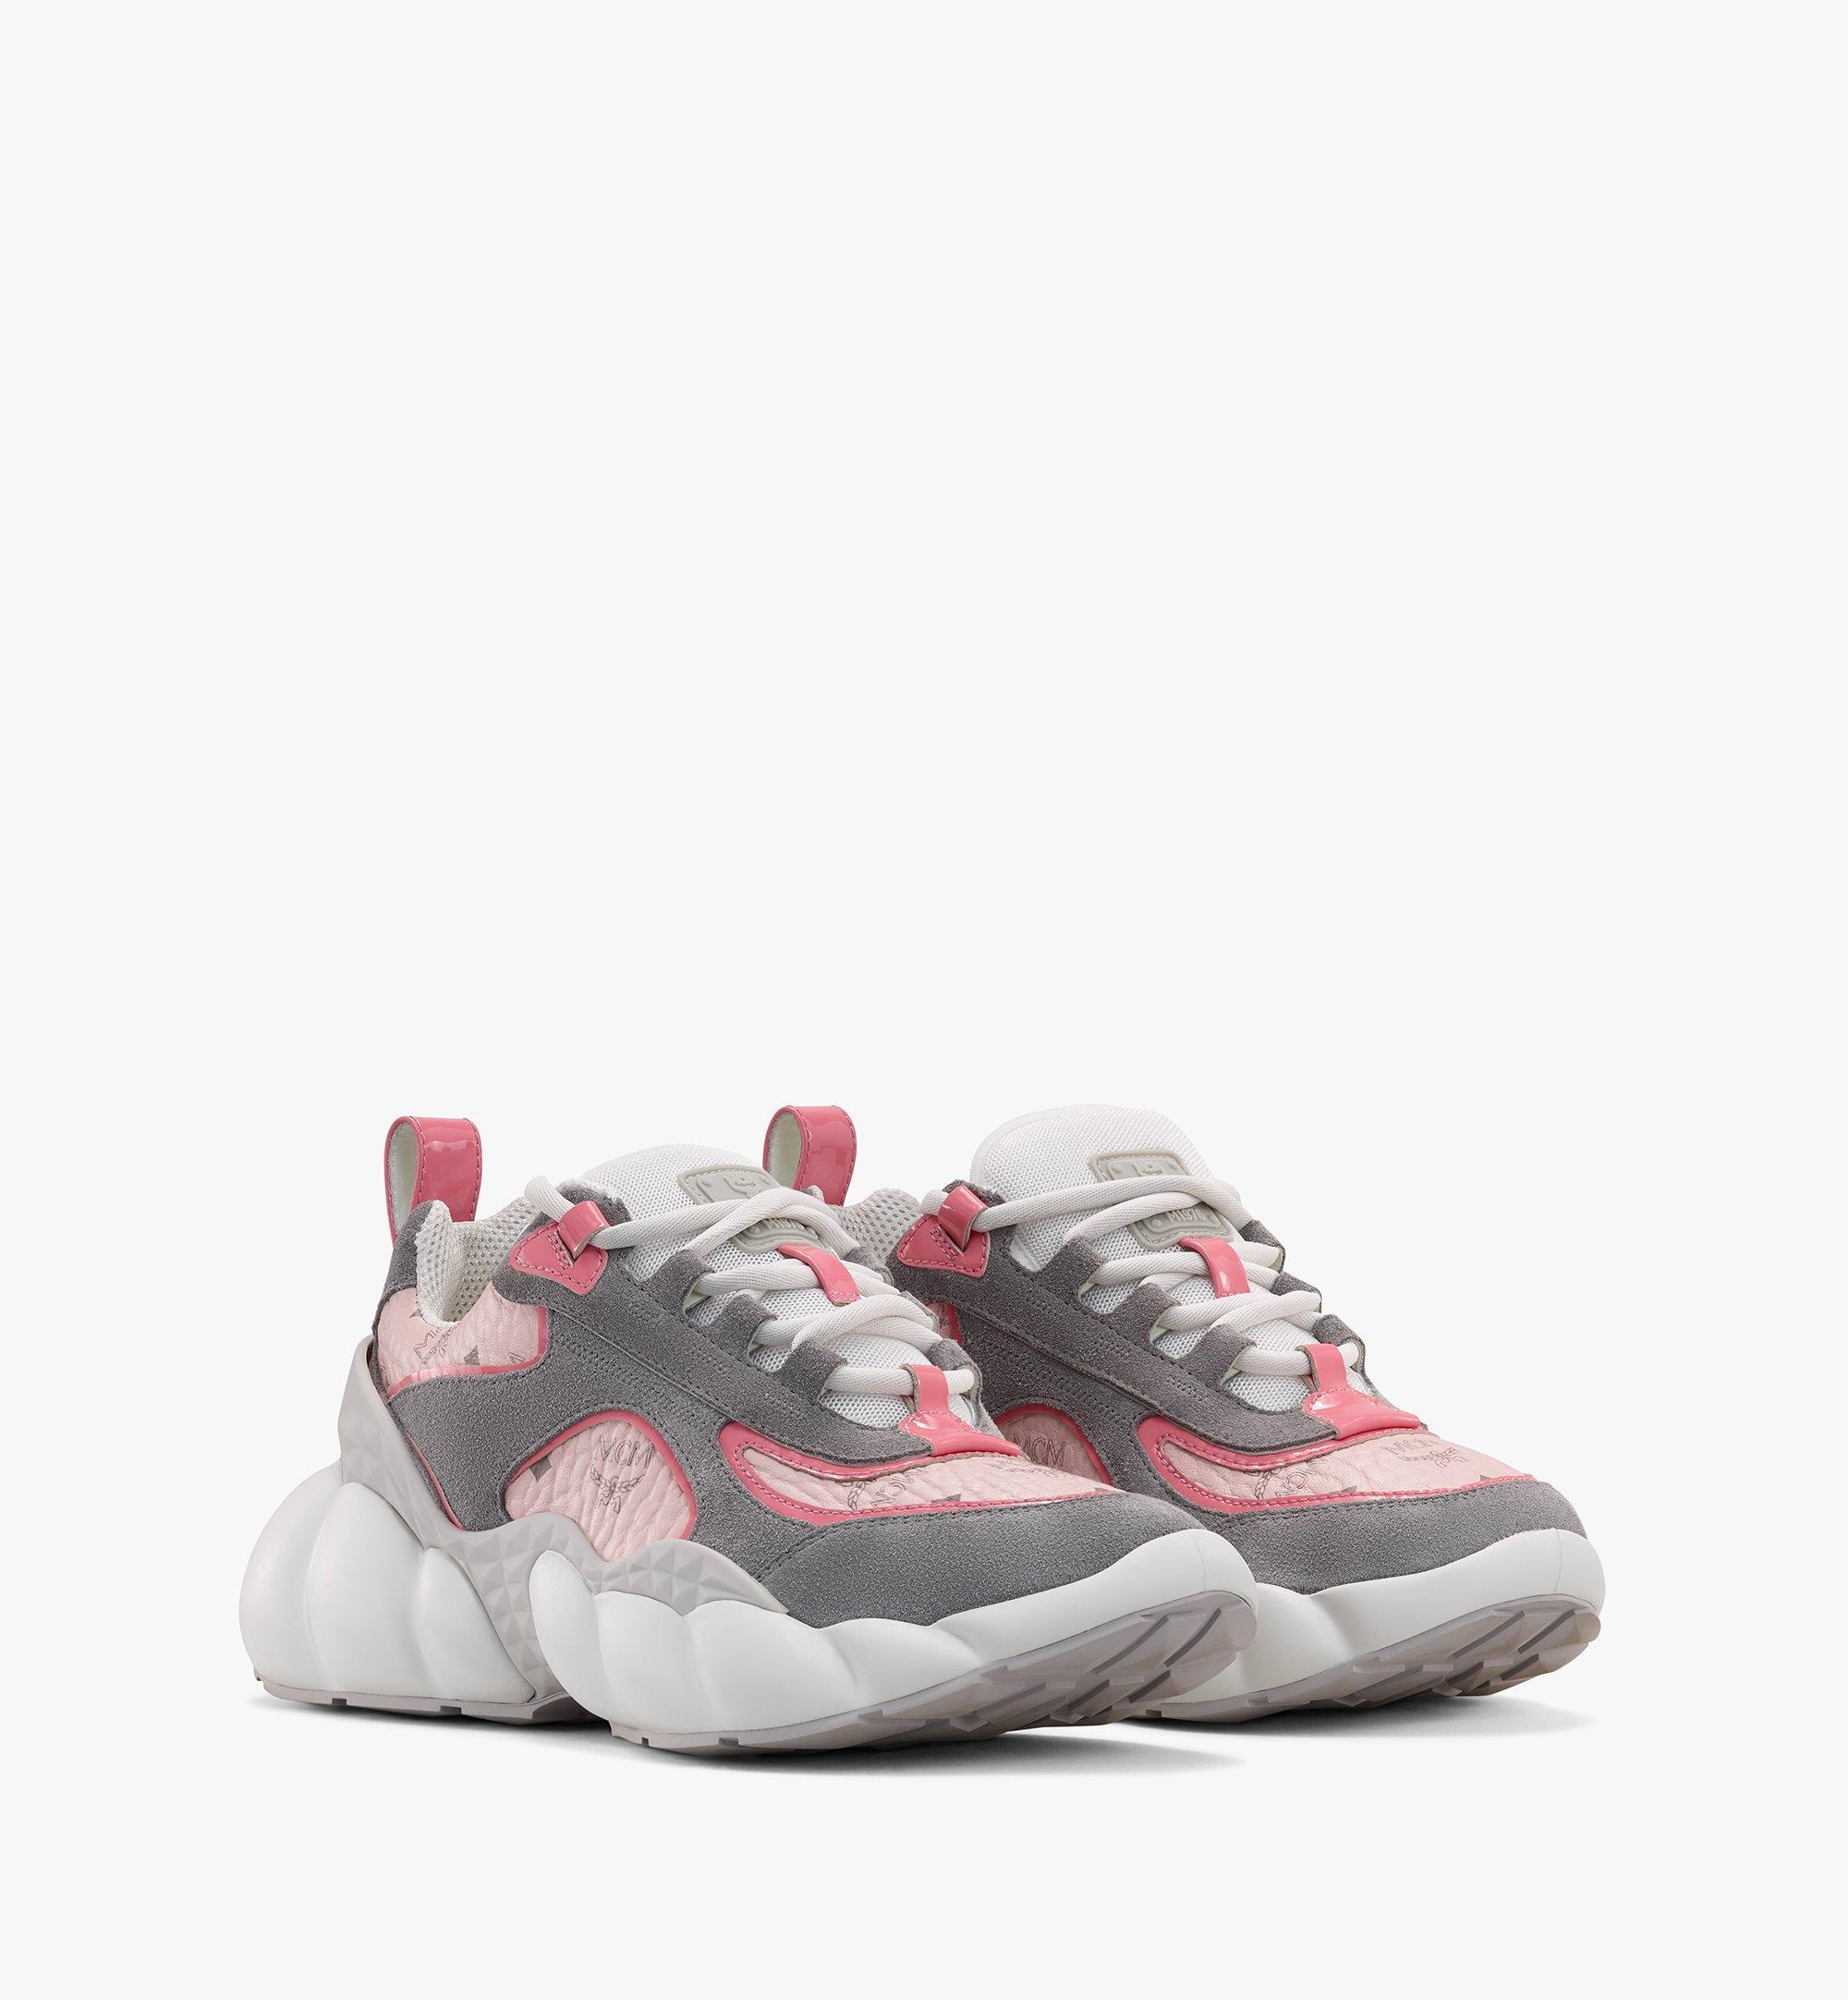 MCM Women's Himmel Low-Top Sneakers in Visetos Pink MESASNX05QH038 Alternate View 1